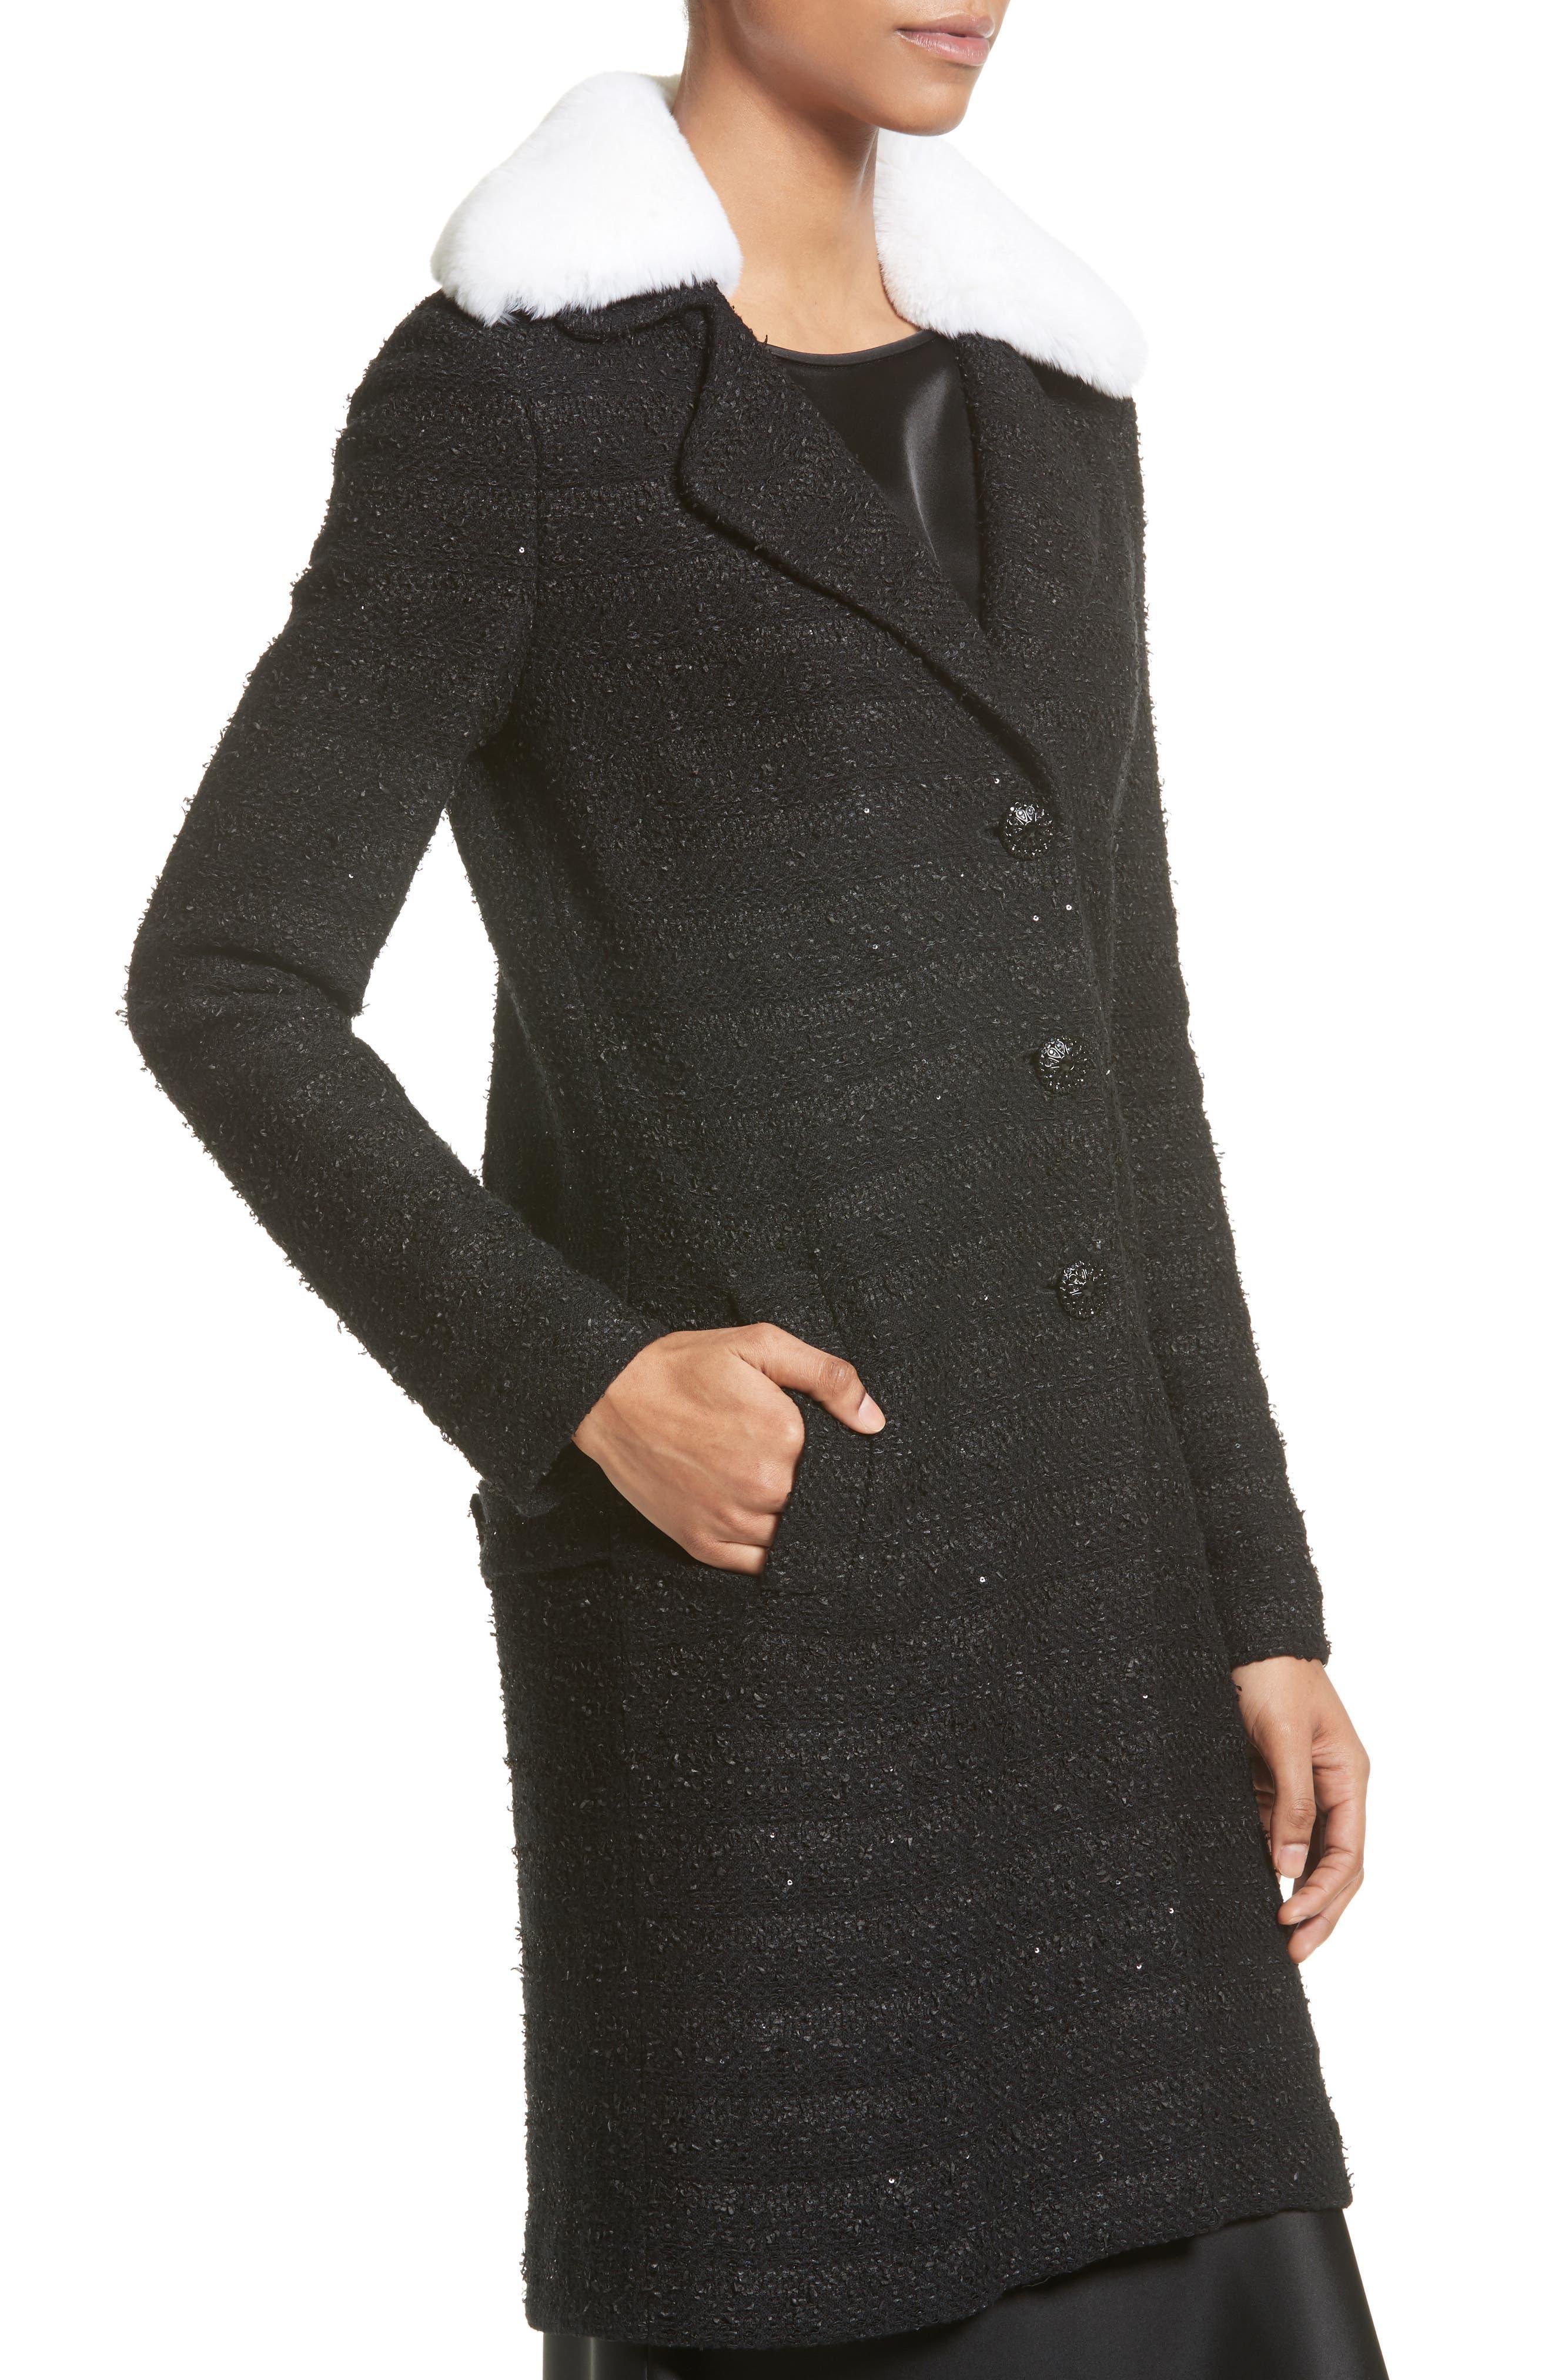 Sequin Knit Topper with Detachable Genuine Rabbit Fur Collar,                             Alternate thumbnail 5, color,                             001